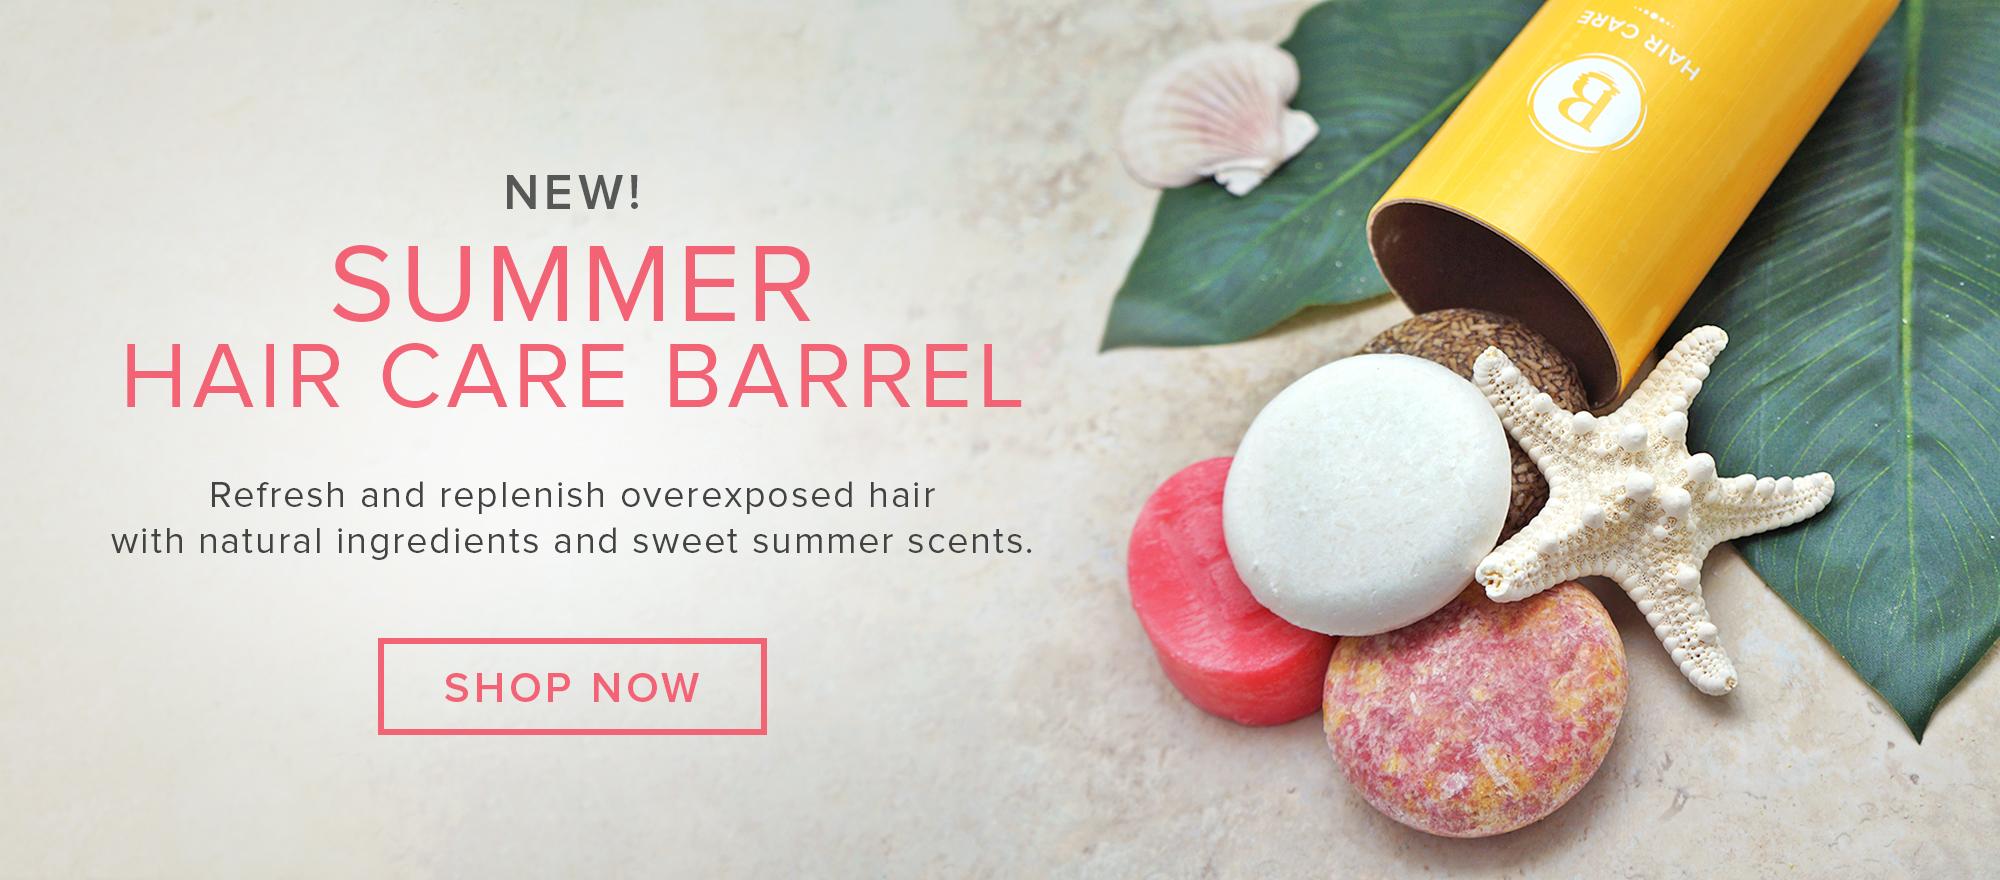 Summer Hair Care Barrel